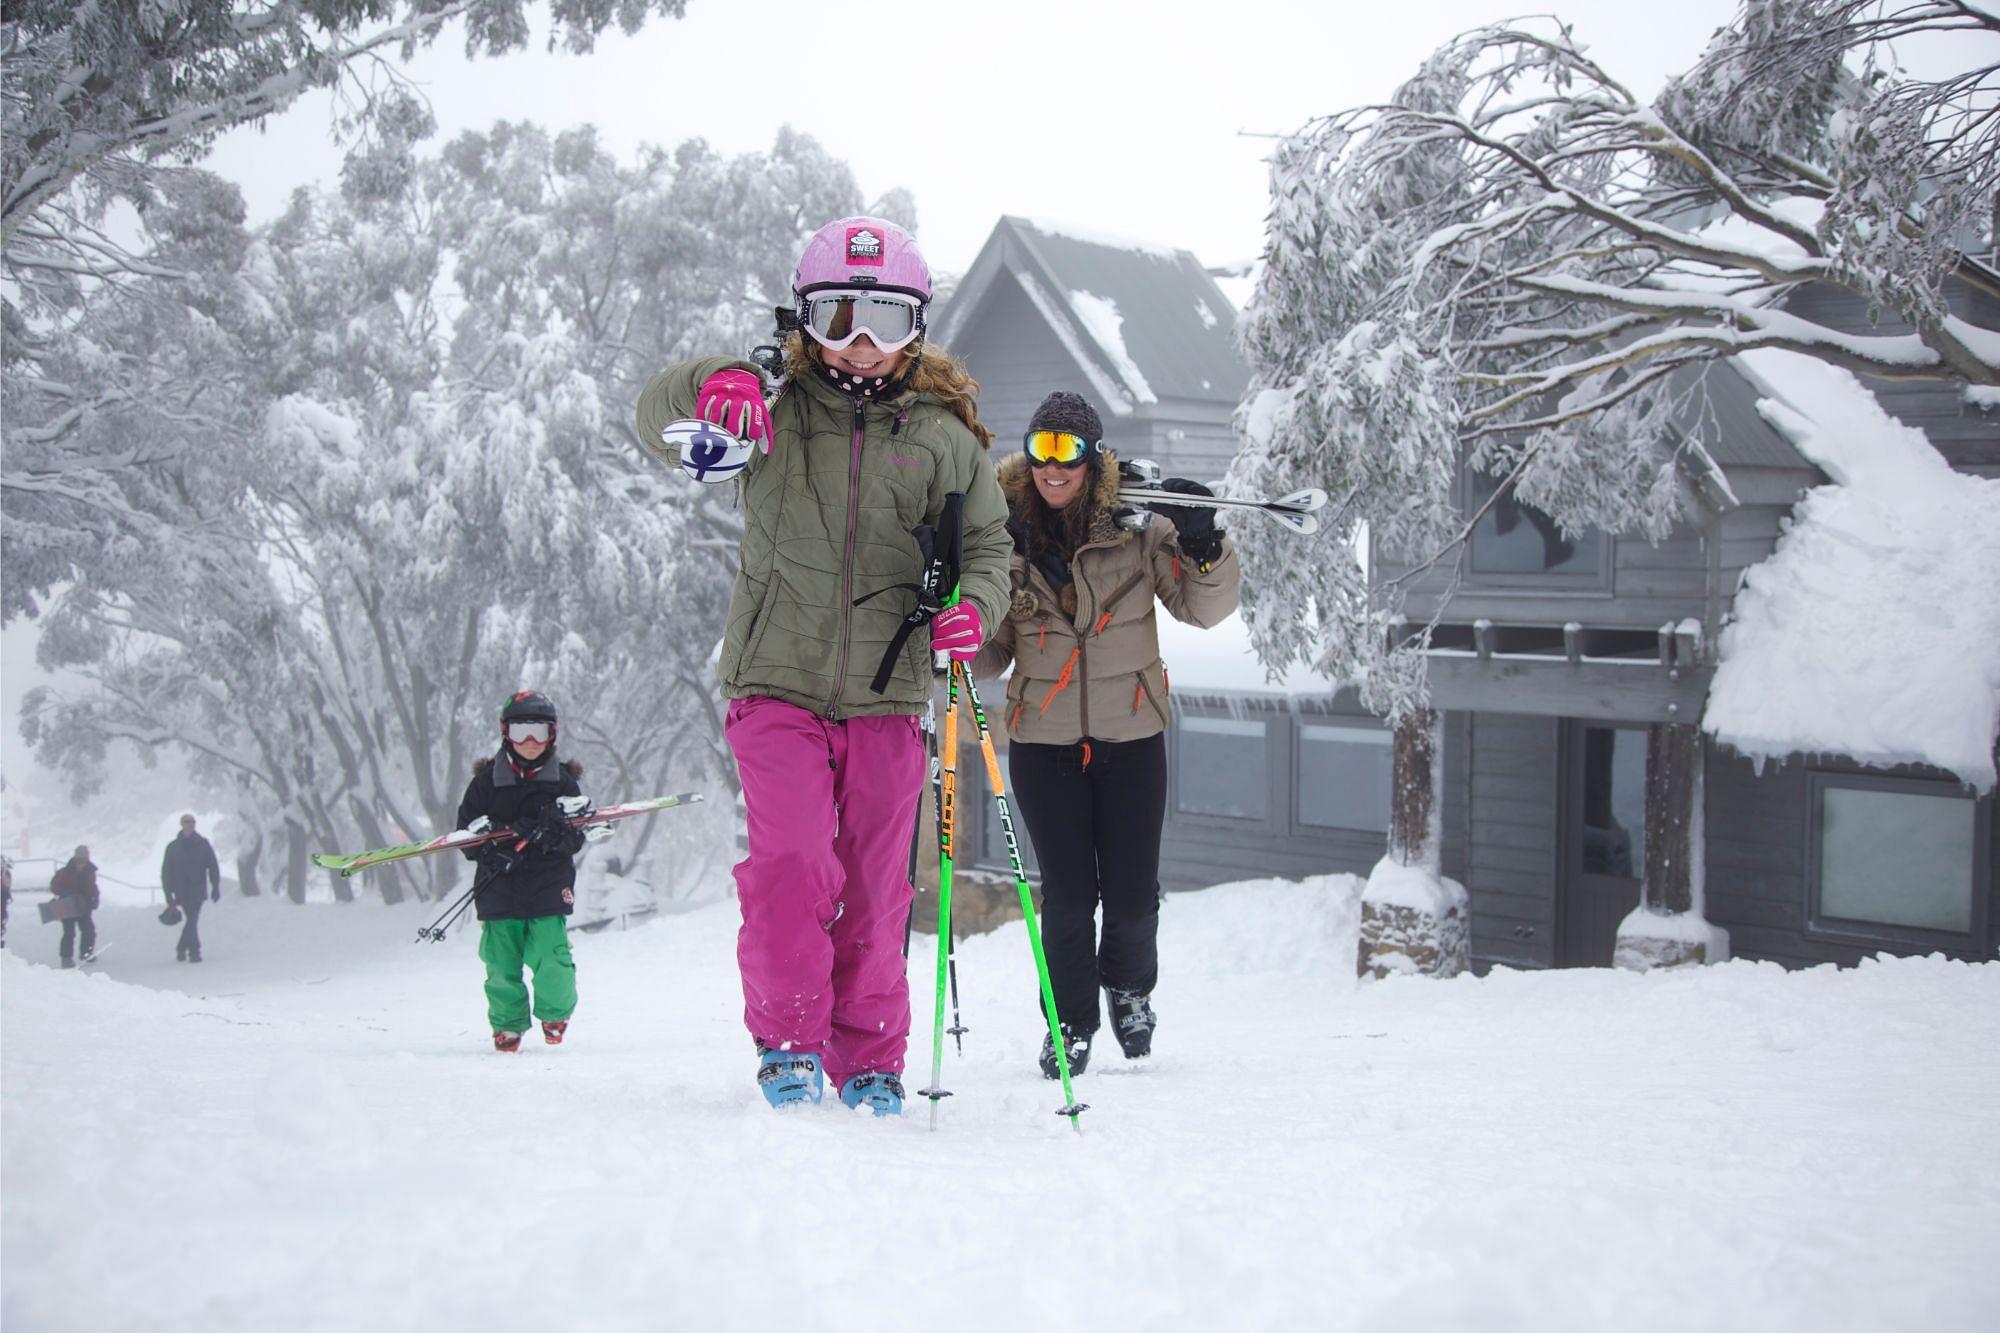 Skiing in Mount Buller, Victoria, Australia